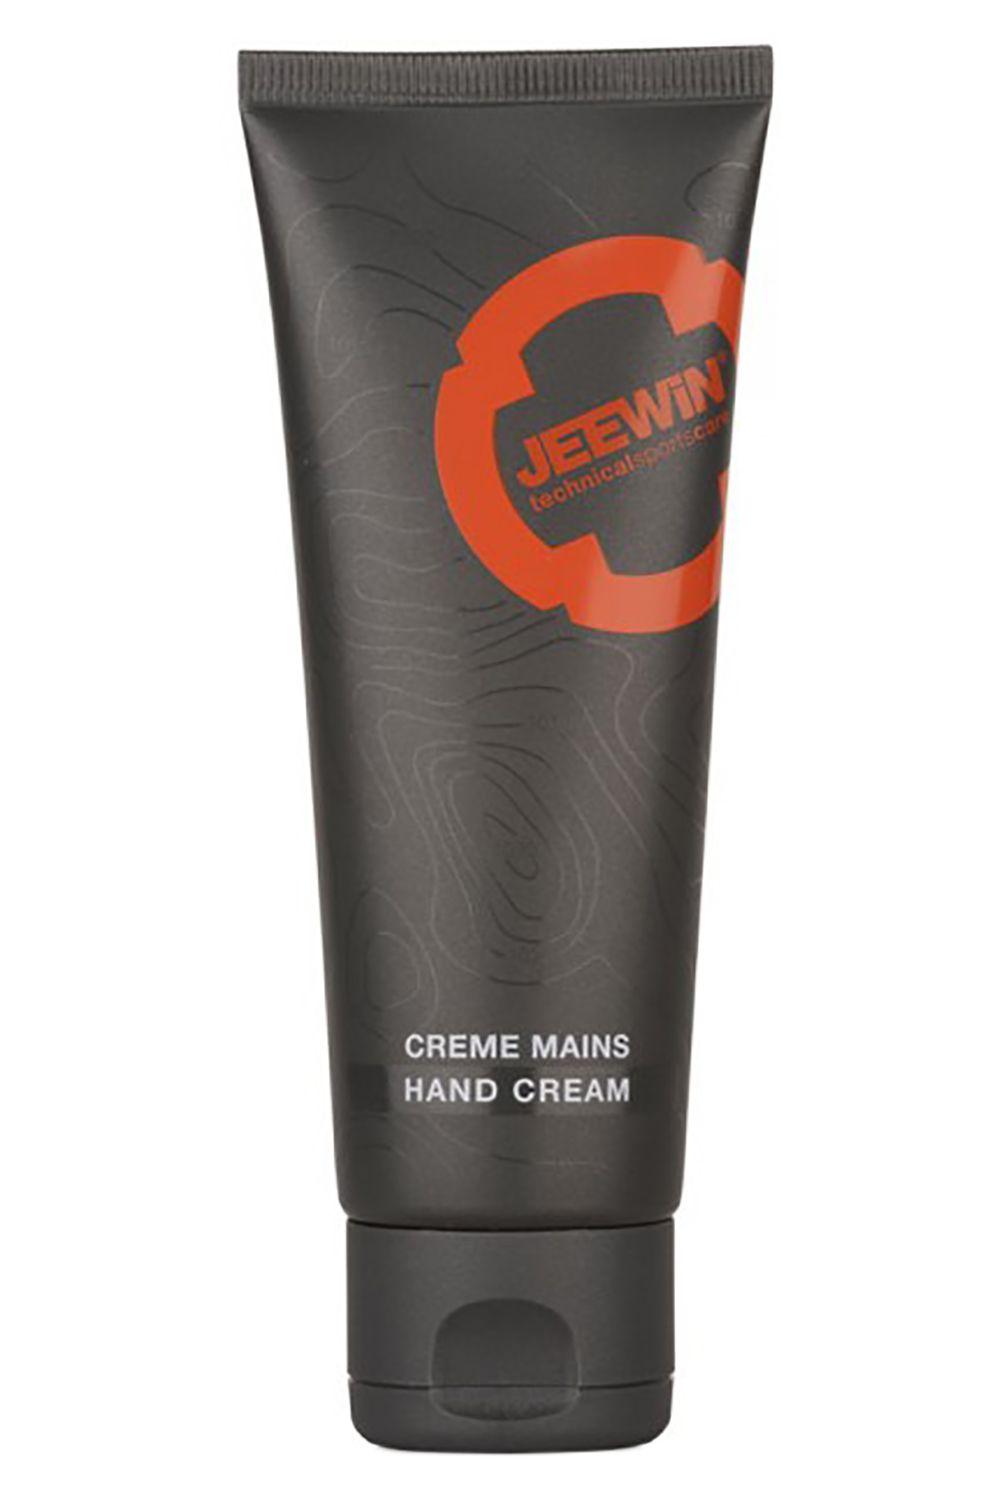 Jeewin Sunscreen HAND CREAM - 75ML Assorted